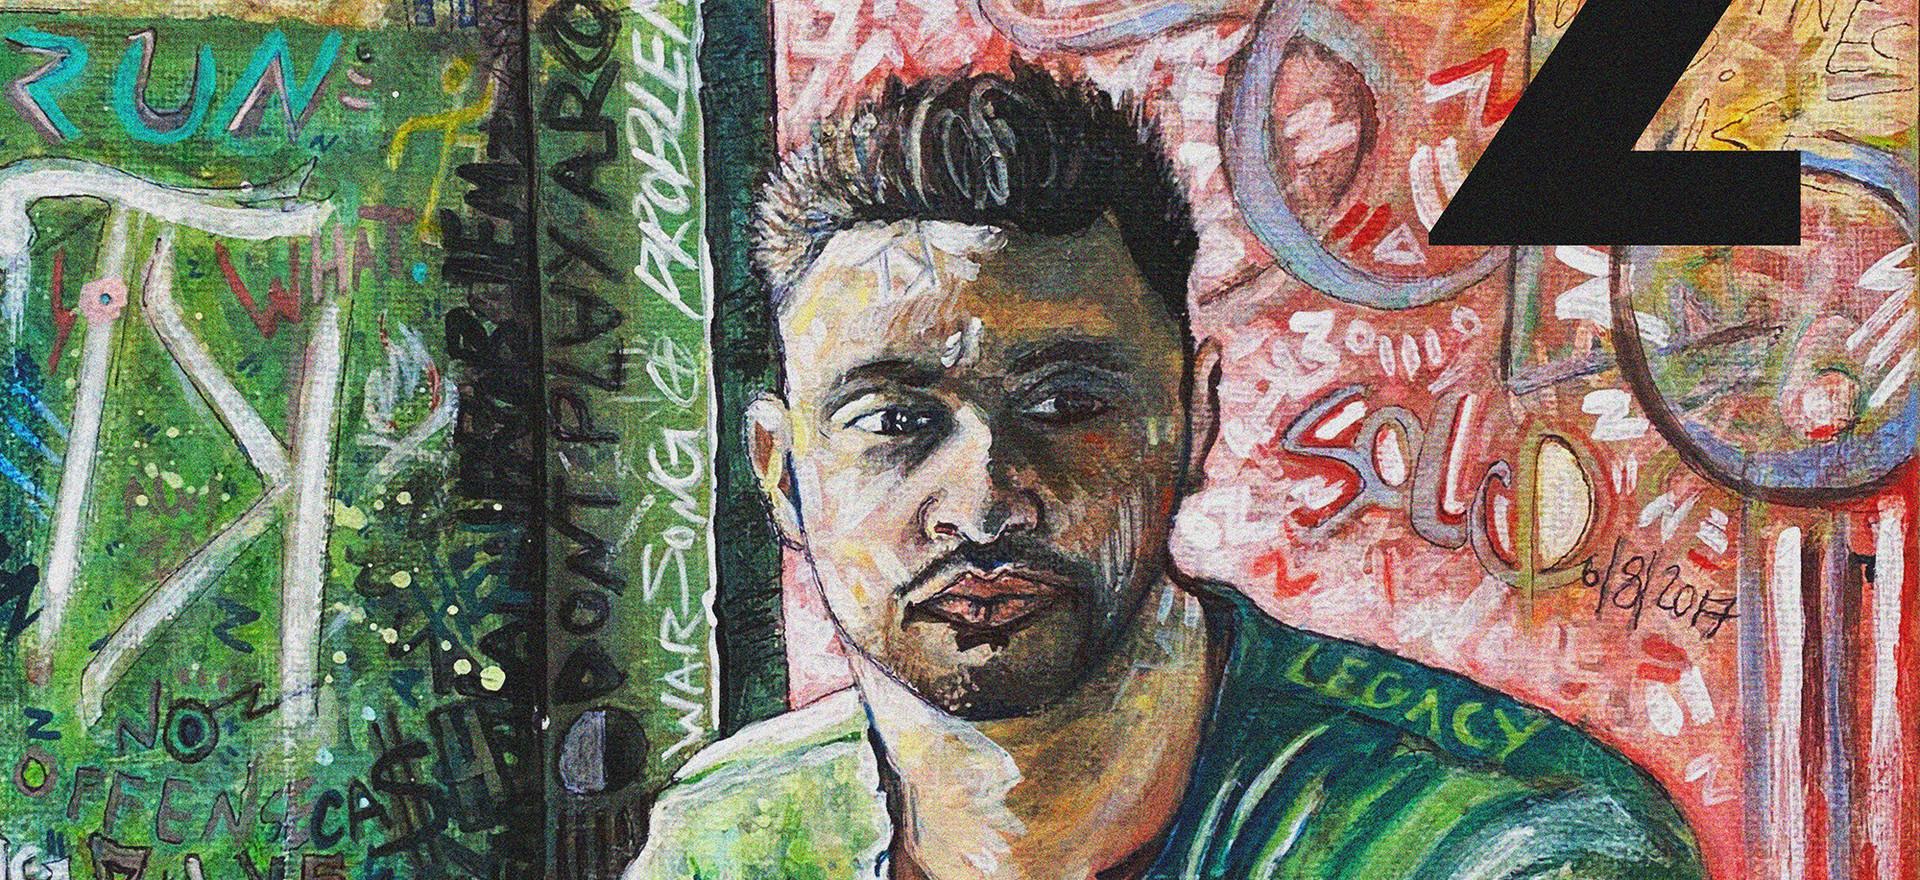 "Music Illustration Highlight Artist: Tony K  Close up of details. 12"" x 12"" canvas"